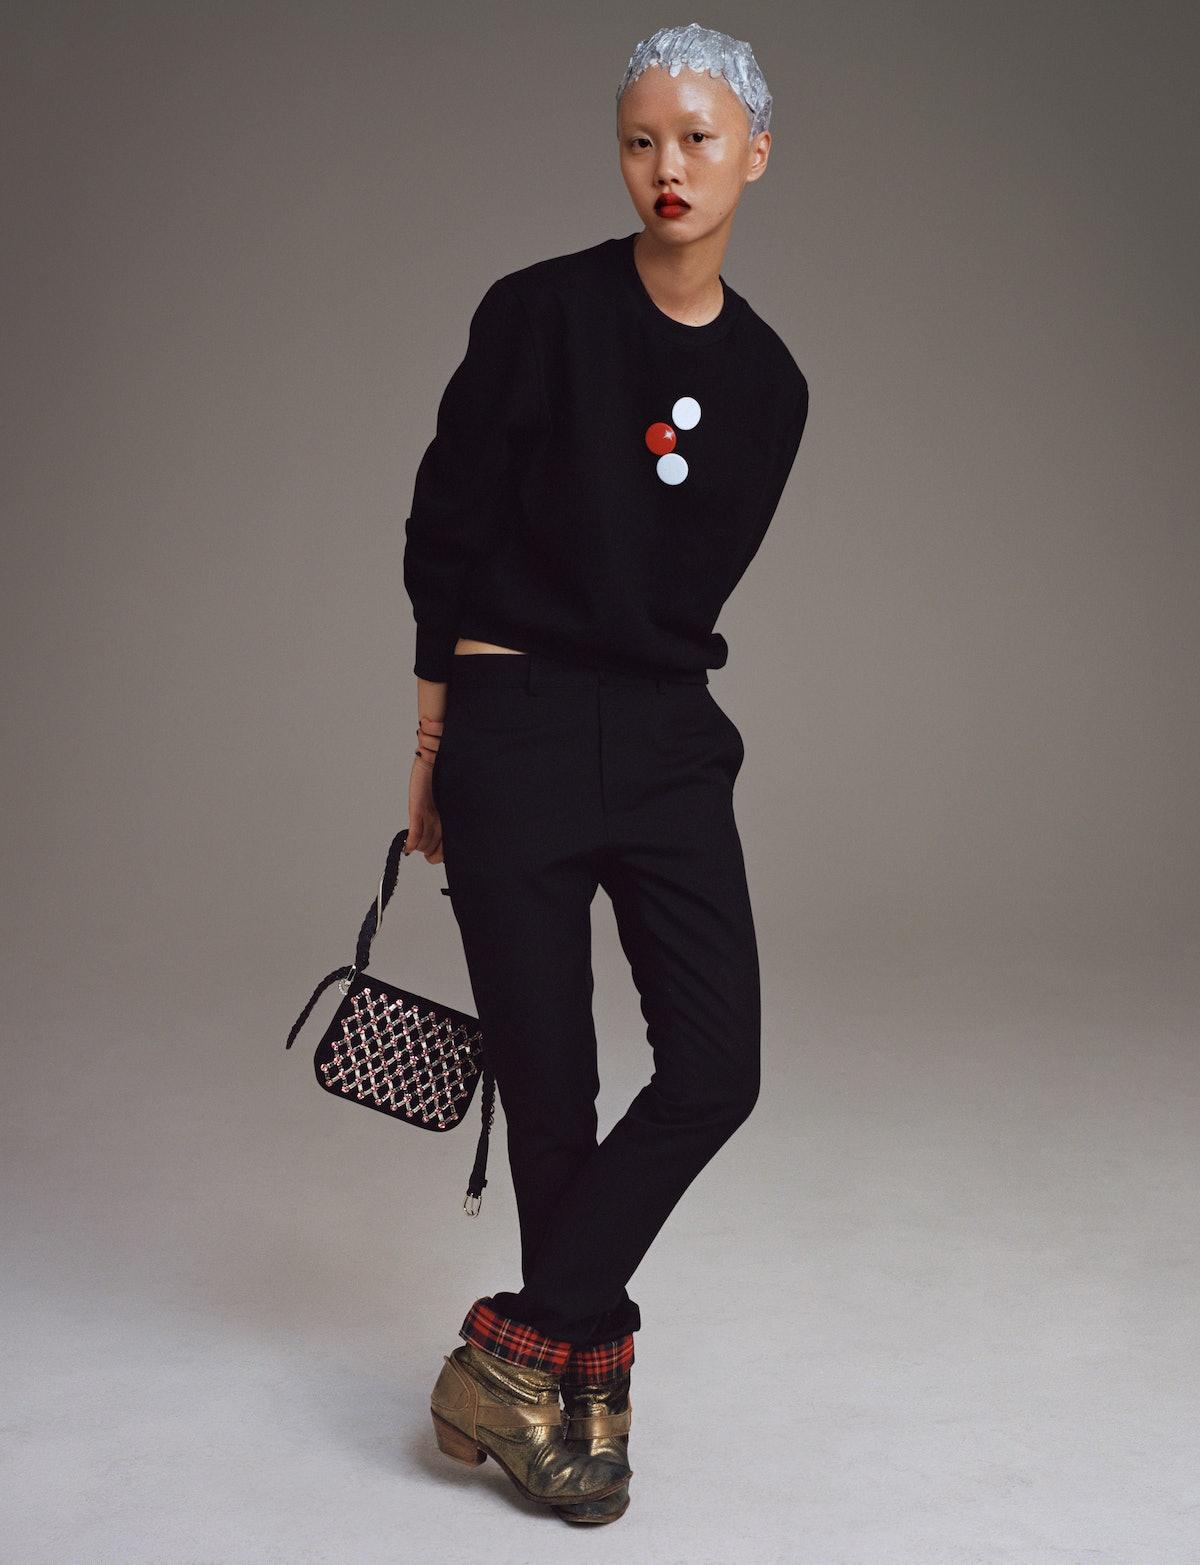 Model Jan Baiboon wears a Stefan Cooke sweater and pants; Miu Miu bag; vintage Junya Watanabe boots.